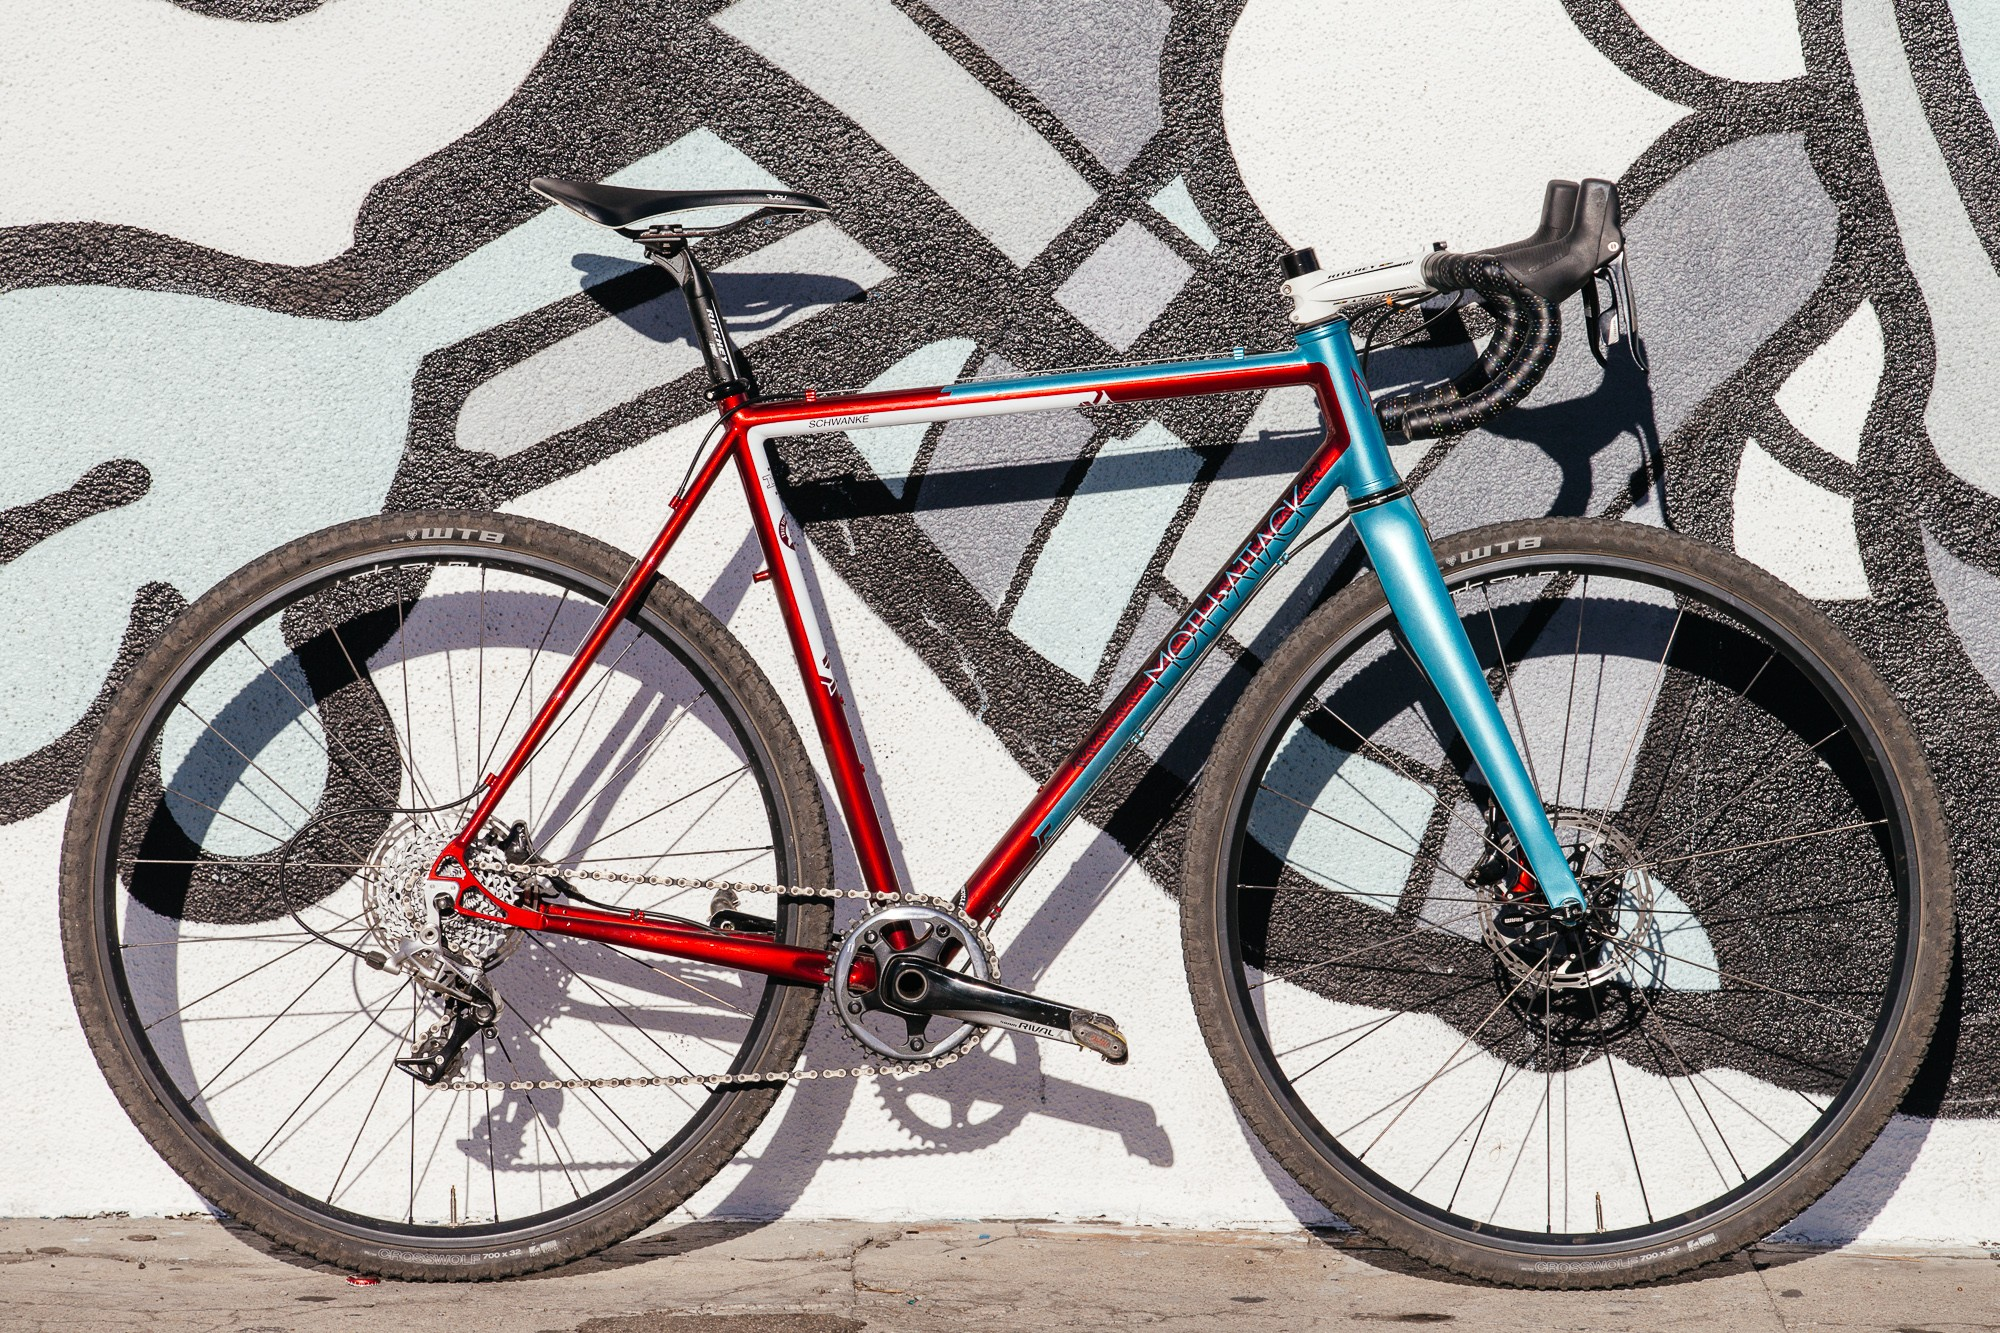 Ericas-Moth-Attack-CX-Team-Bike-10-1335x890@2x.jpg